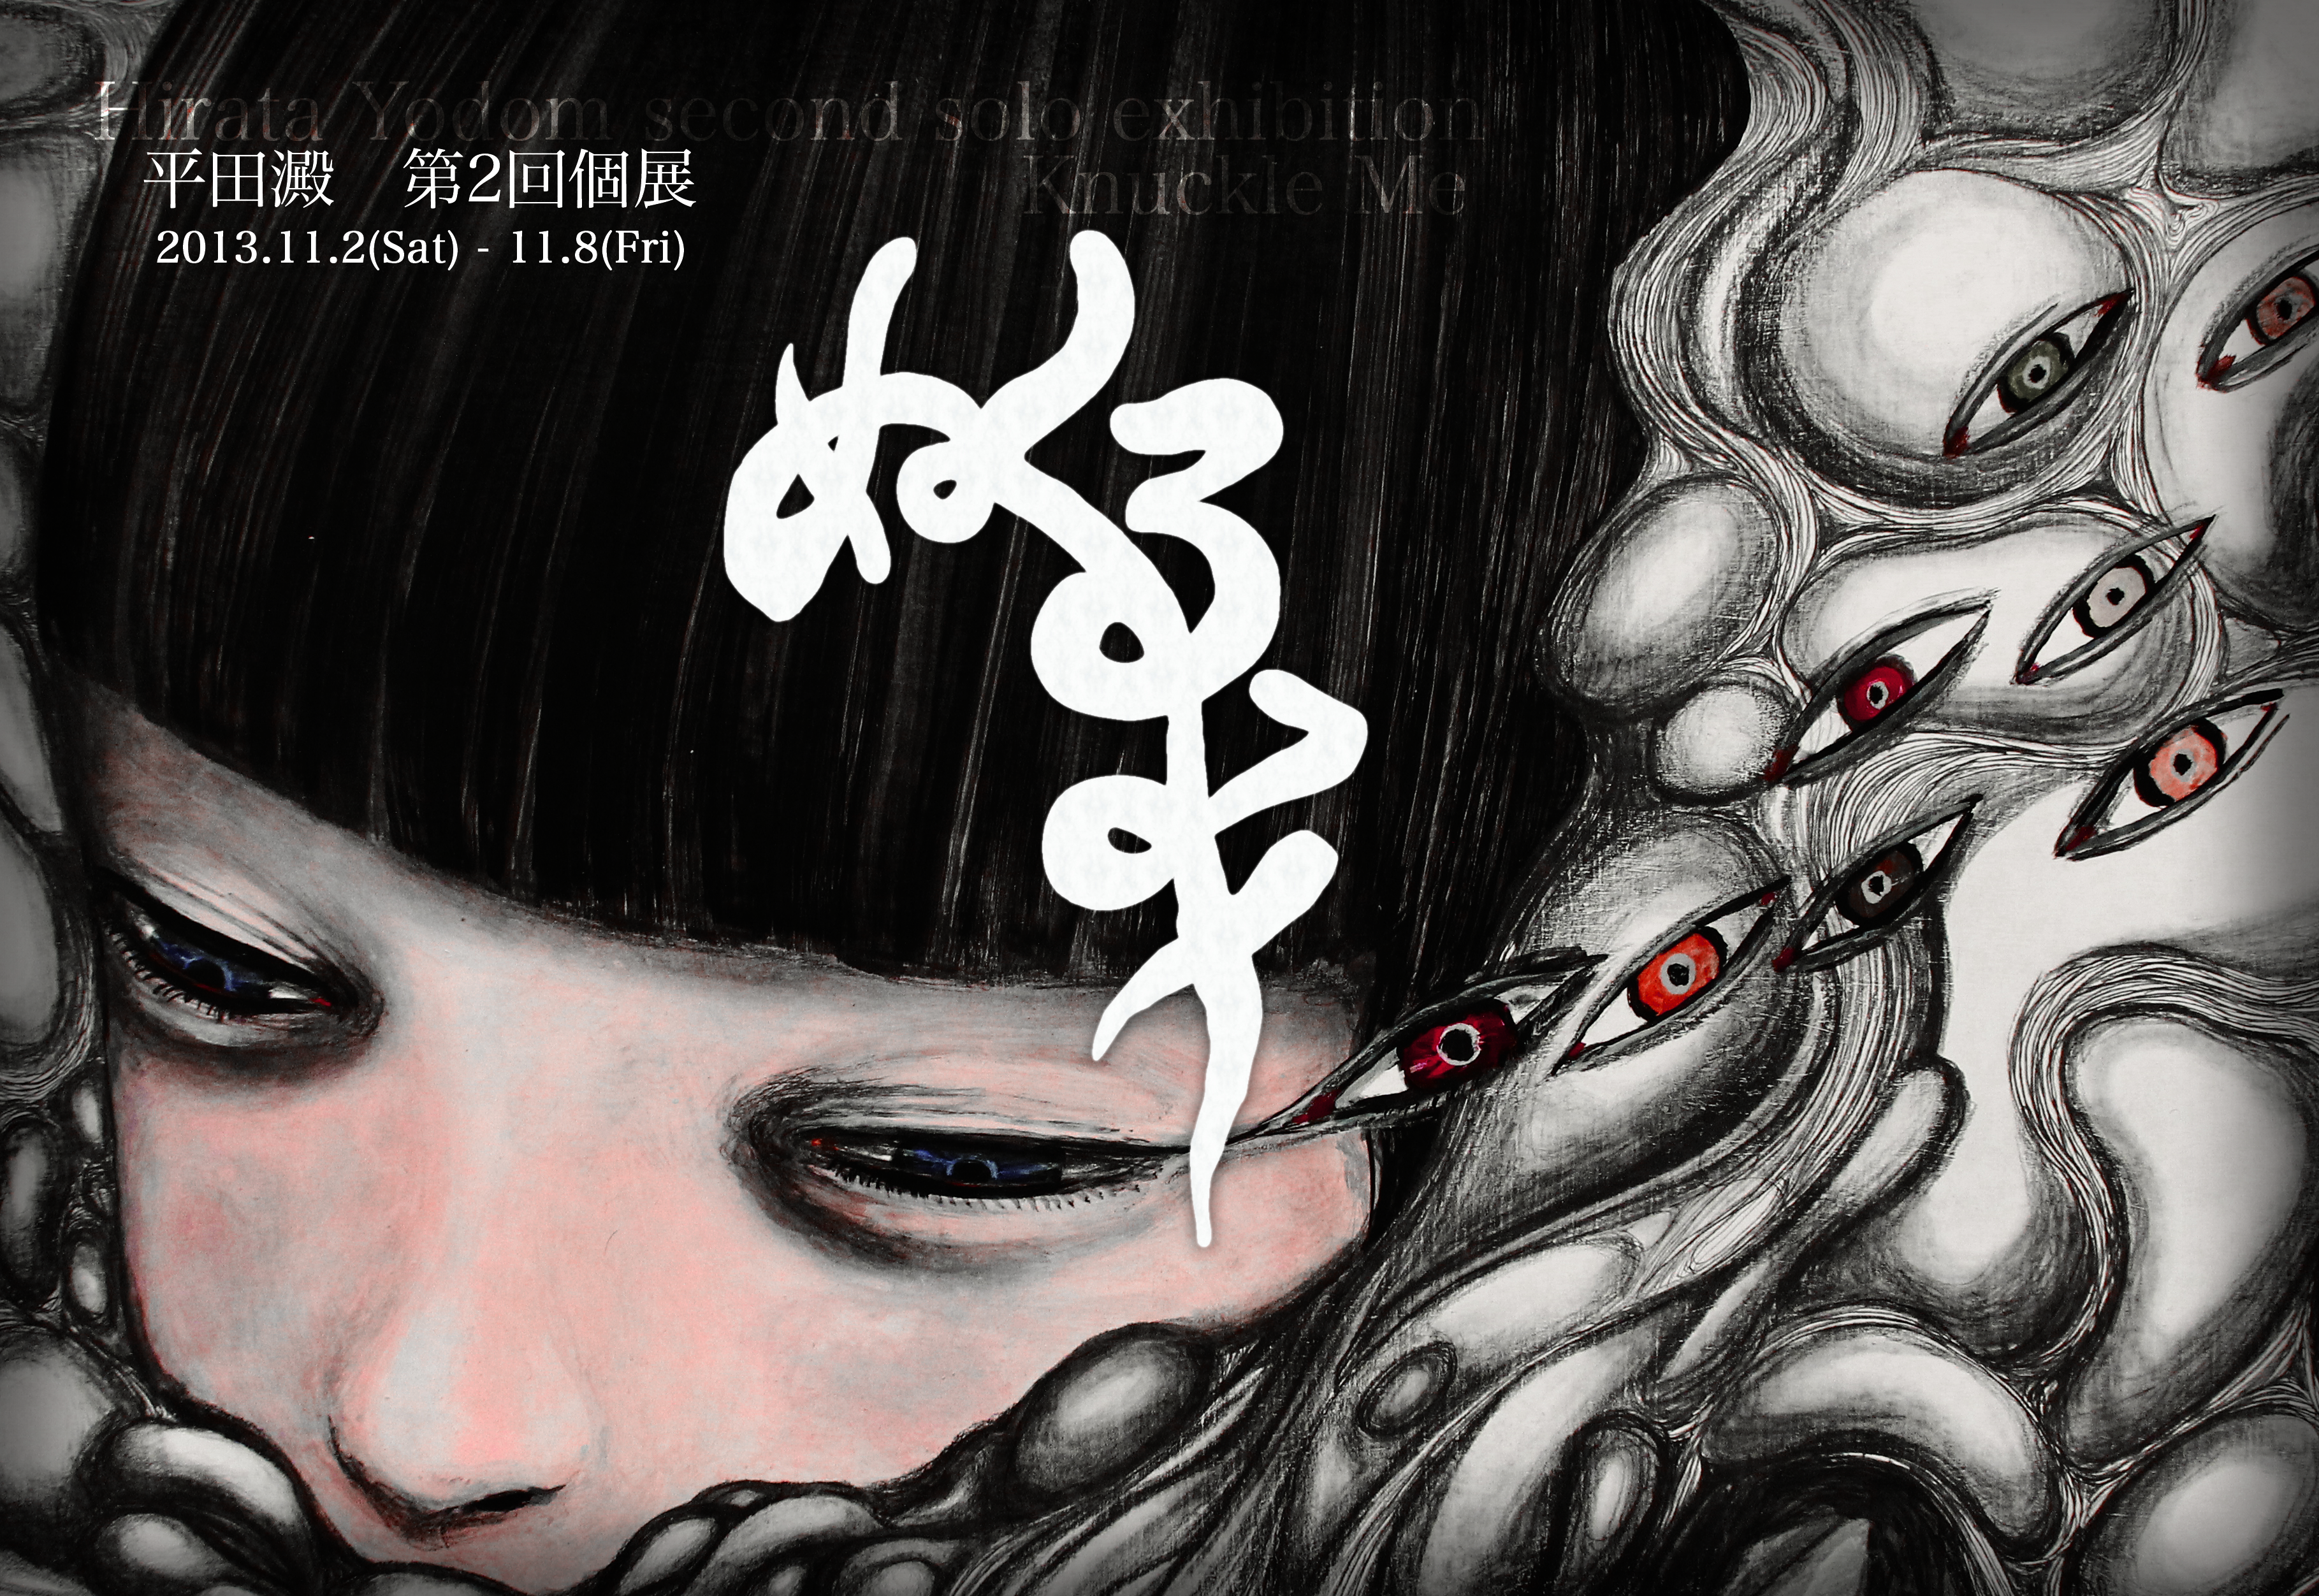 11/2(sat)-11/8(fri) 第2回個展「ぬくるみ」